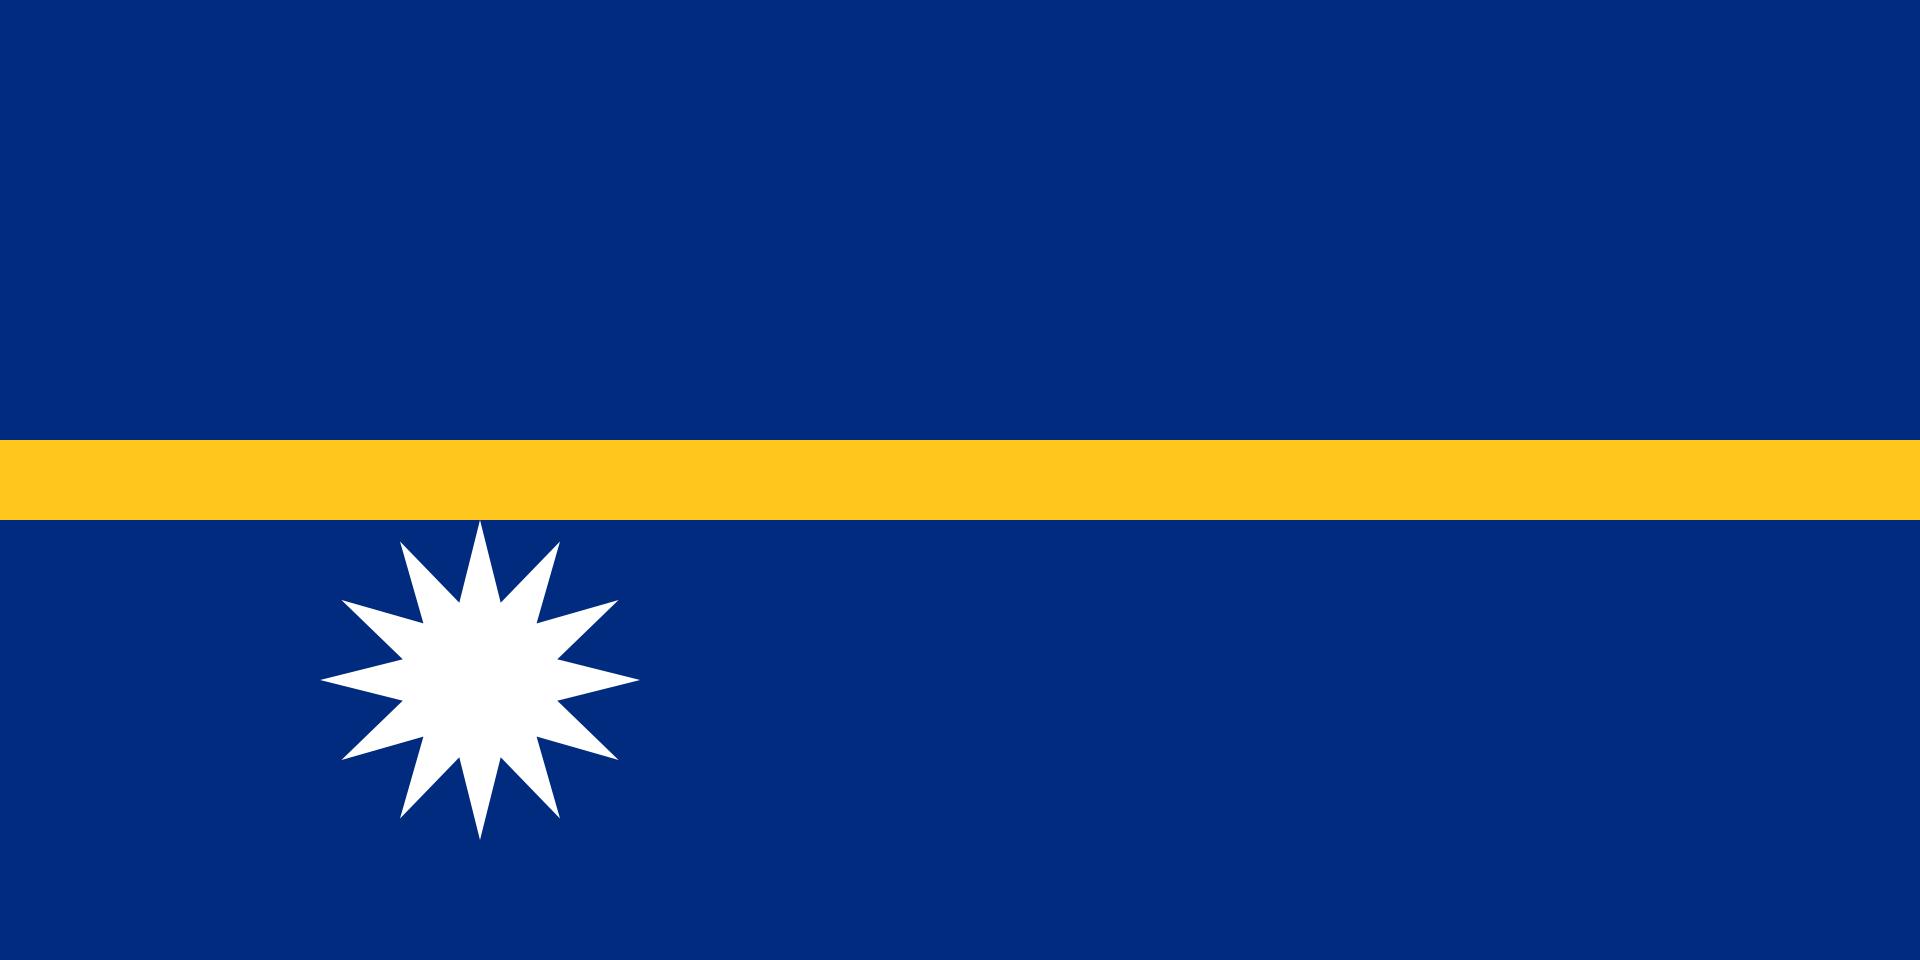 The flag of Nauru.